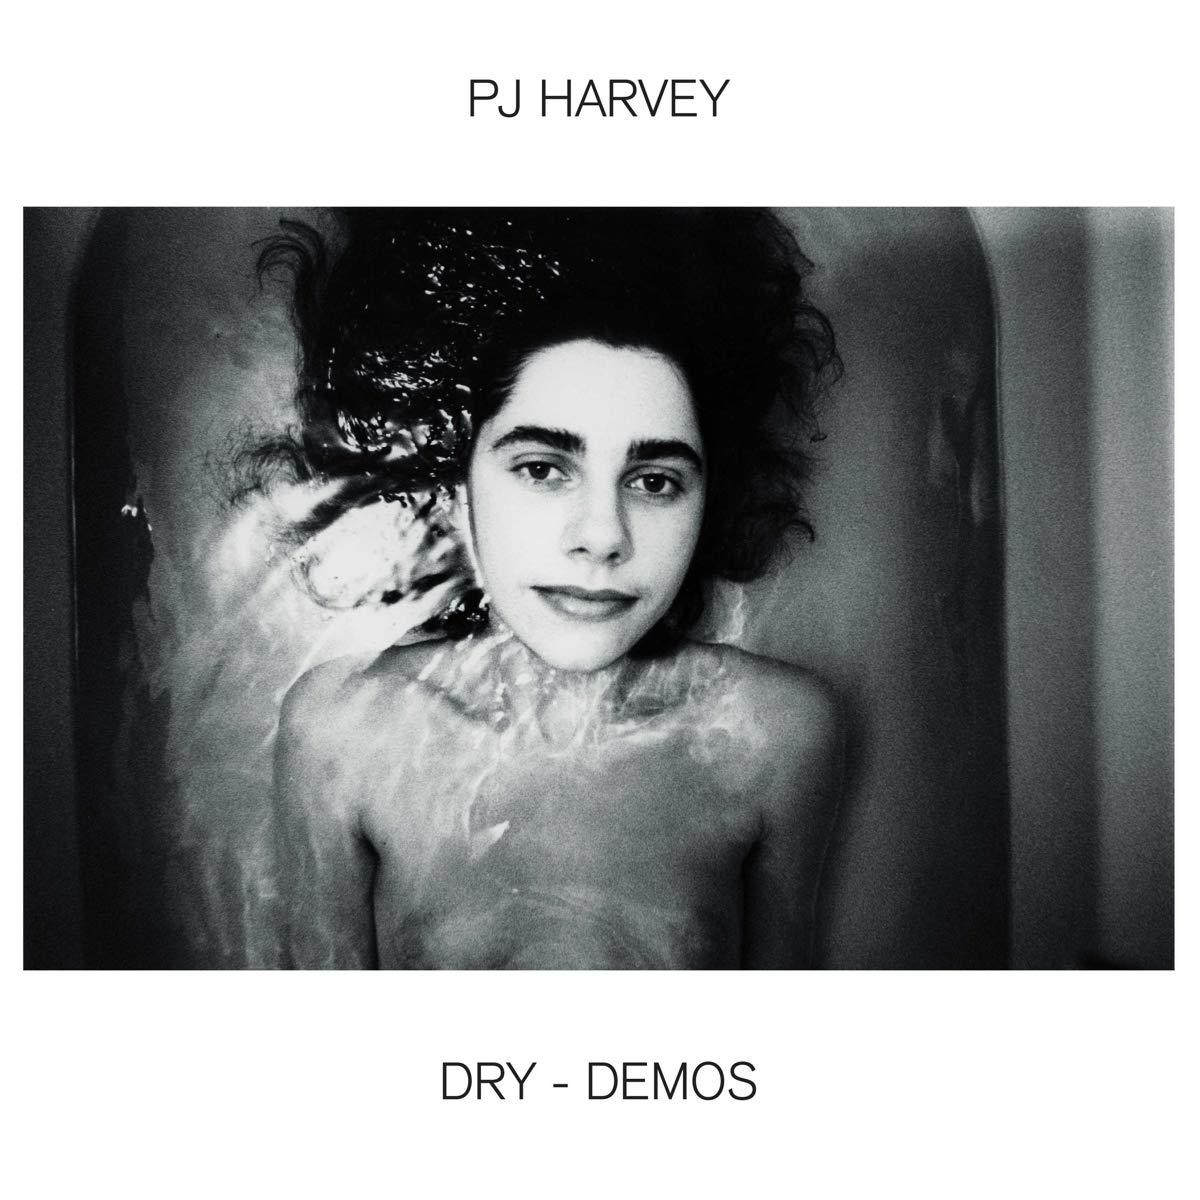 Dry - Demos - PJ Harvey